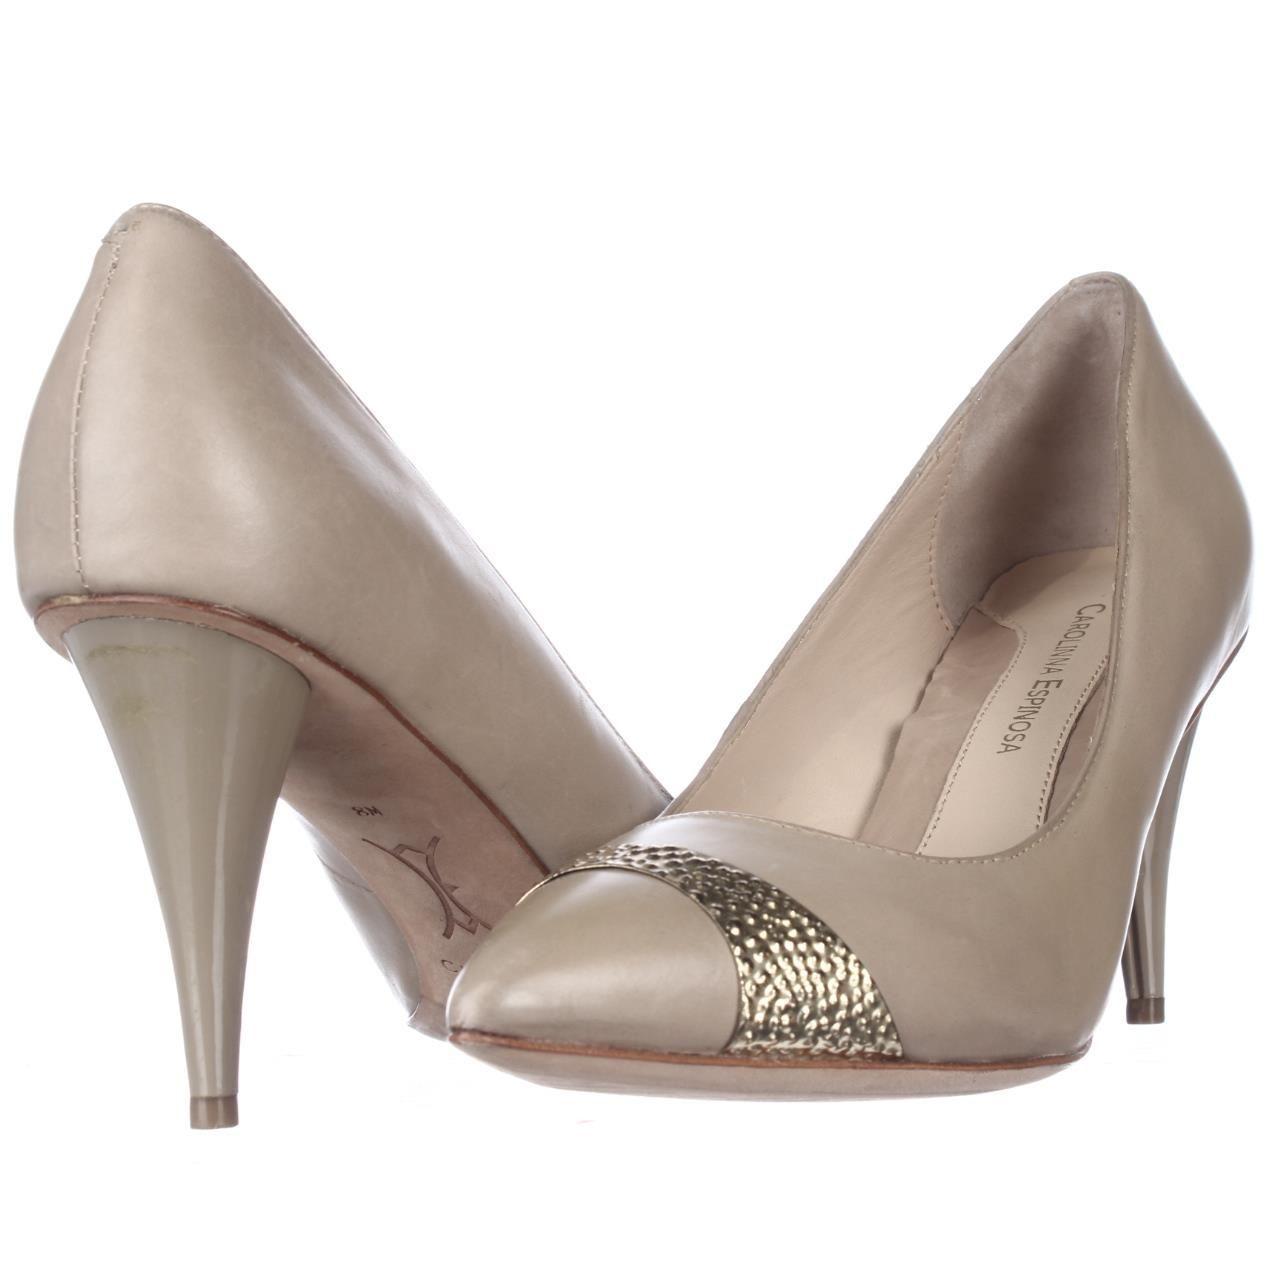 Carolinna Espinosa Desi Classic Heels Sand Leather 8 Us Pumps Nudepumps Nudeheels Heels Classic Classy Shoes Fashi Classic Heels Heels Pumps Heels